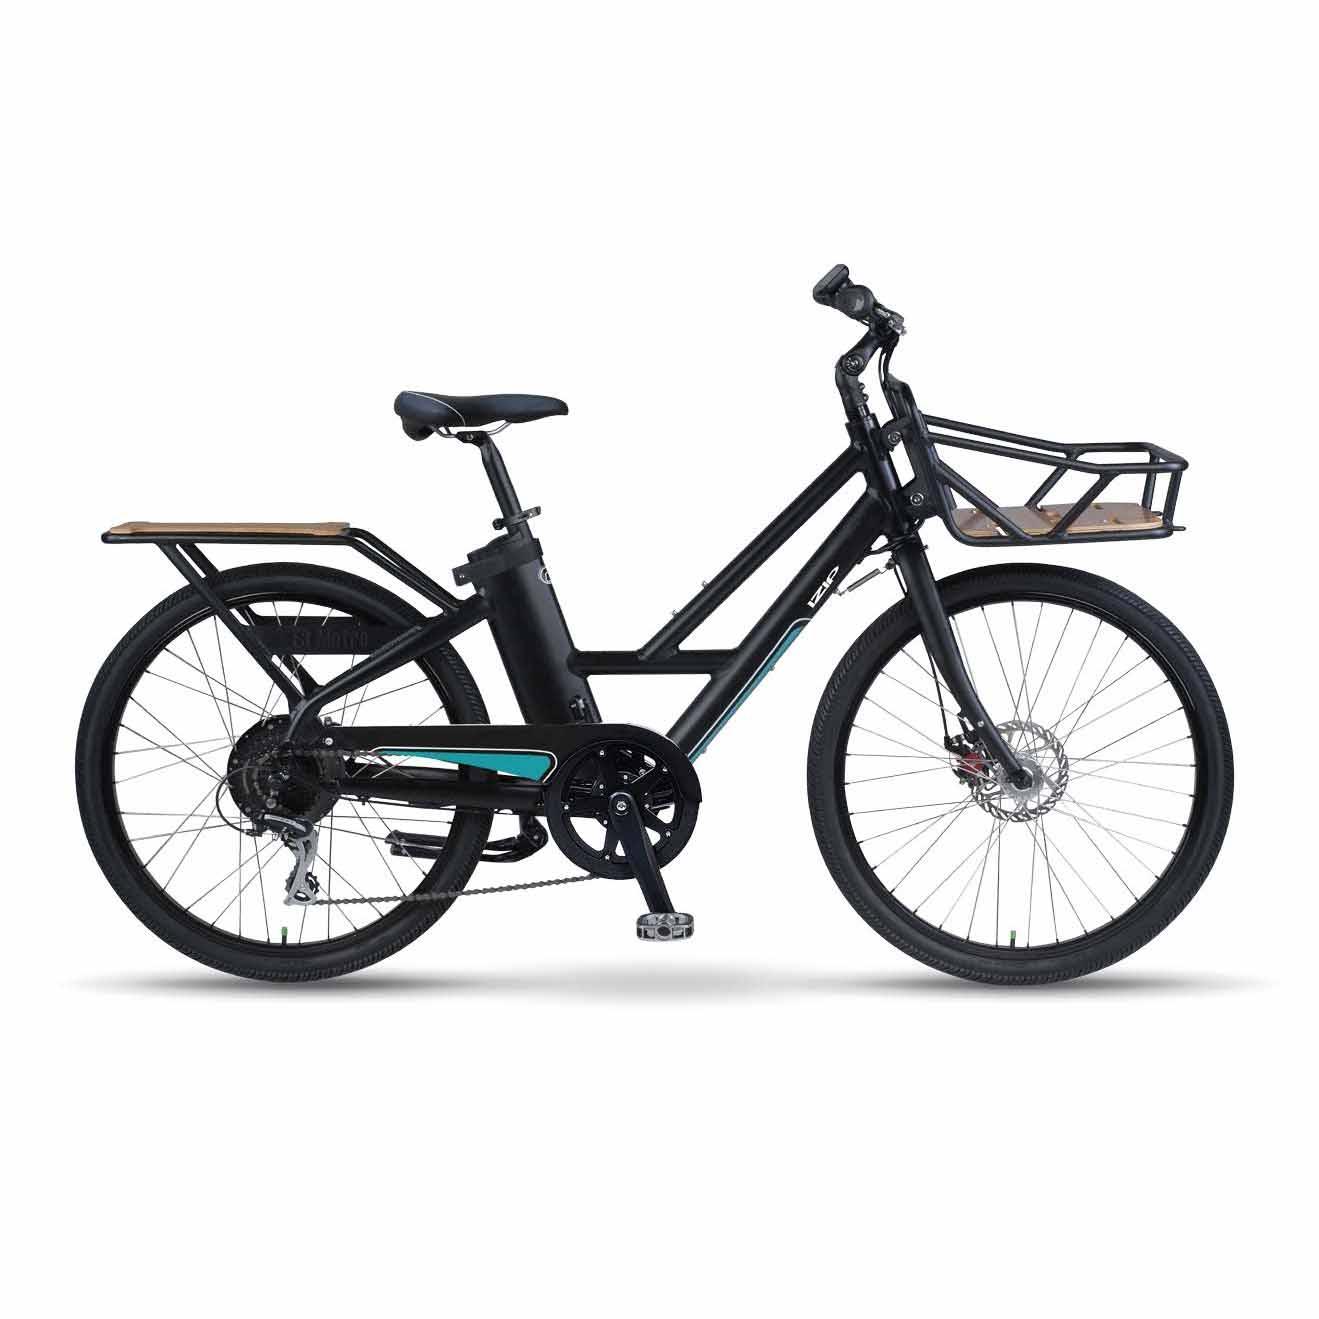 Zanes Cycles - iZip E3 Metro